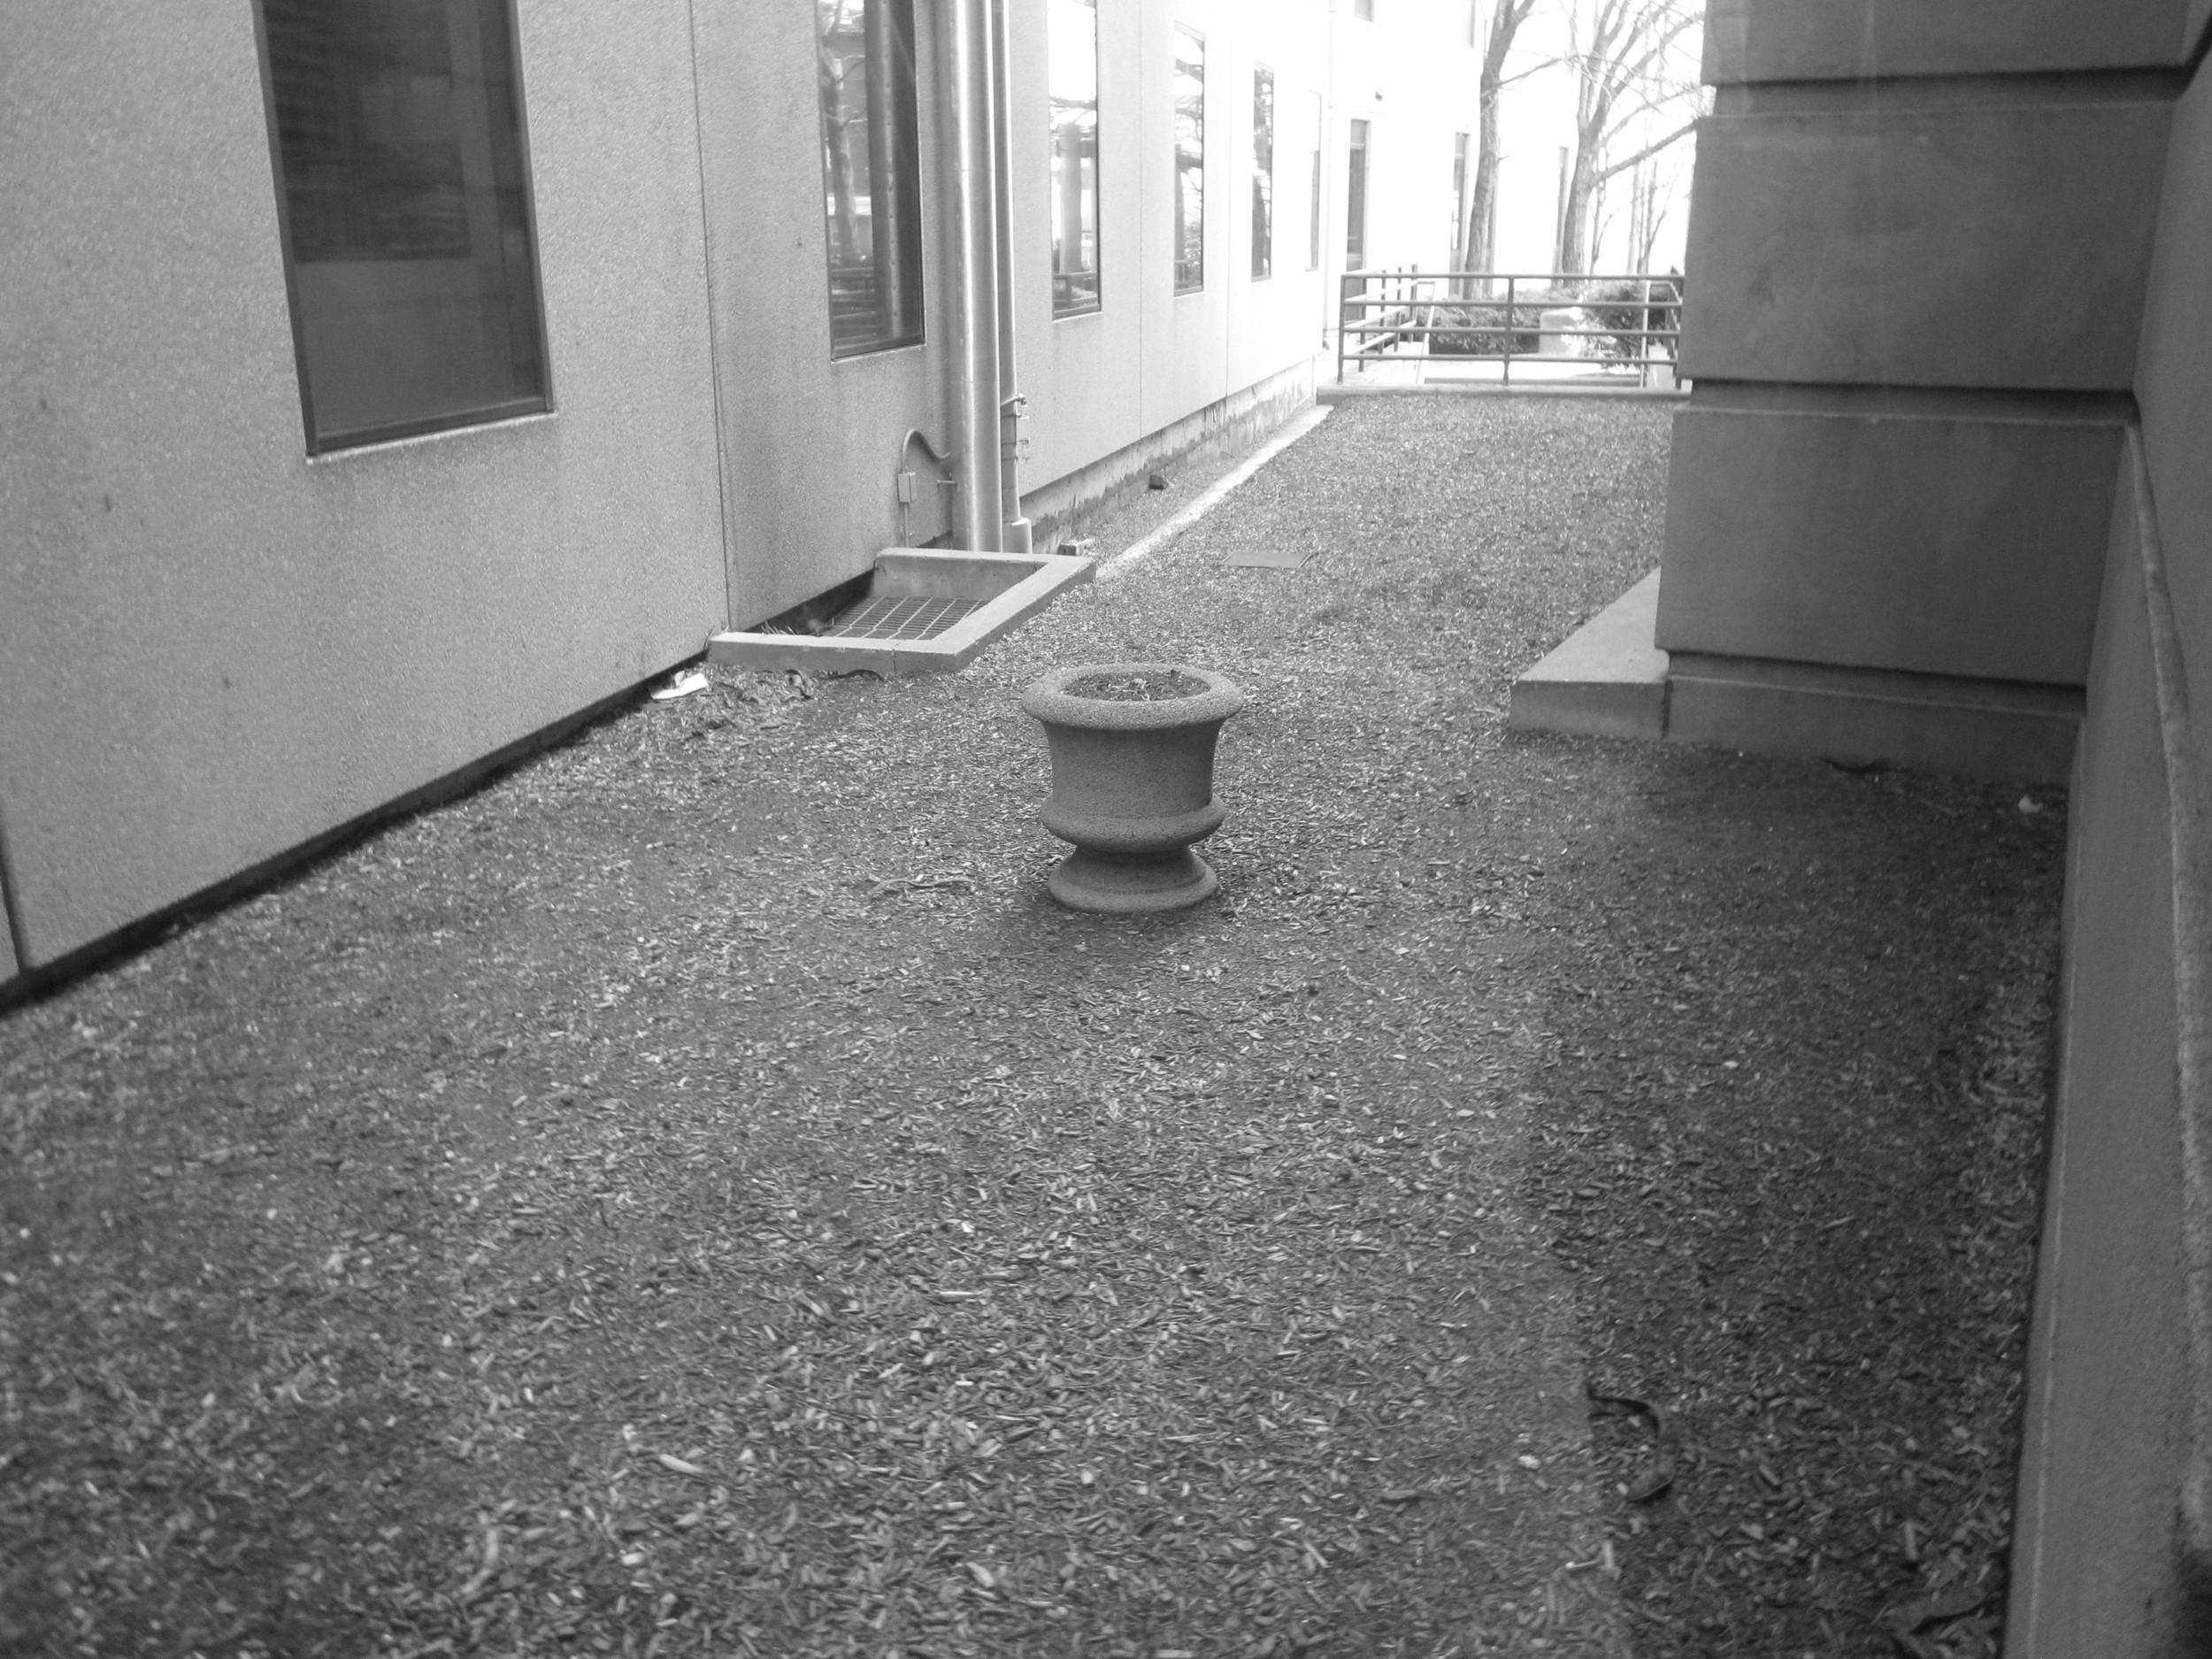 Interstitial garden before